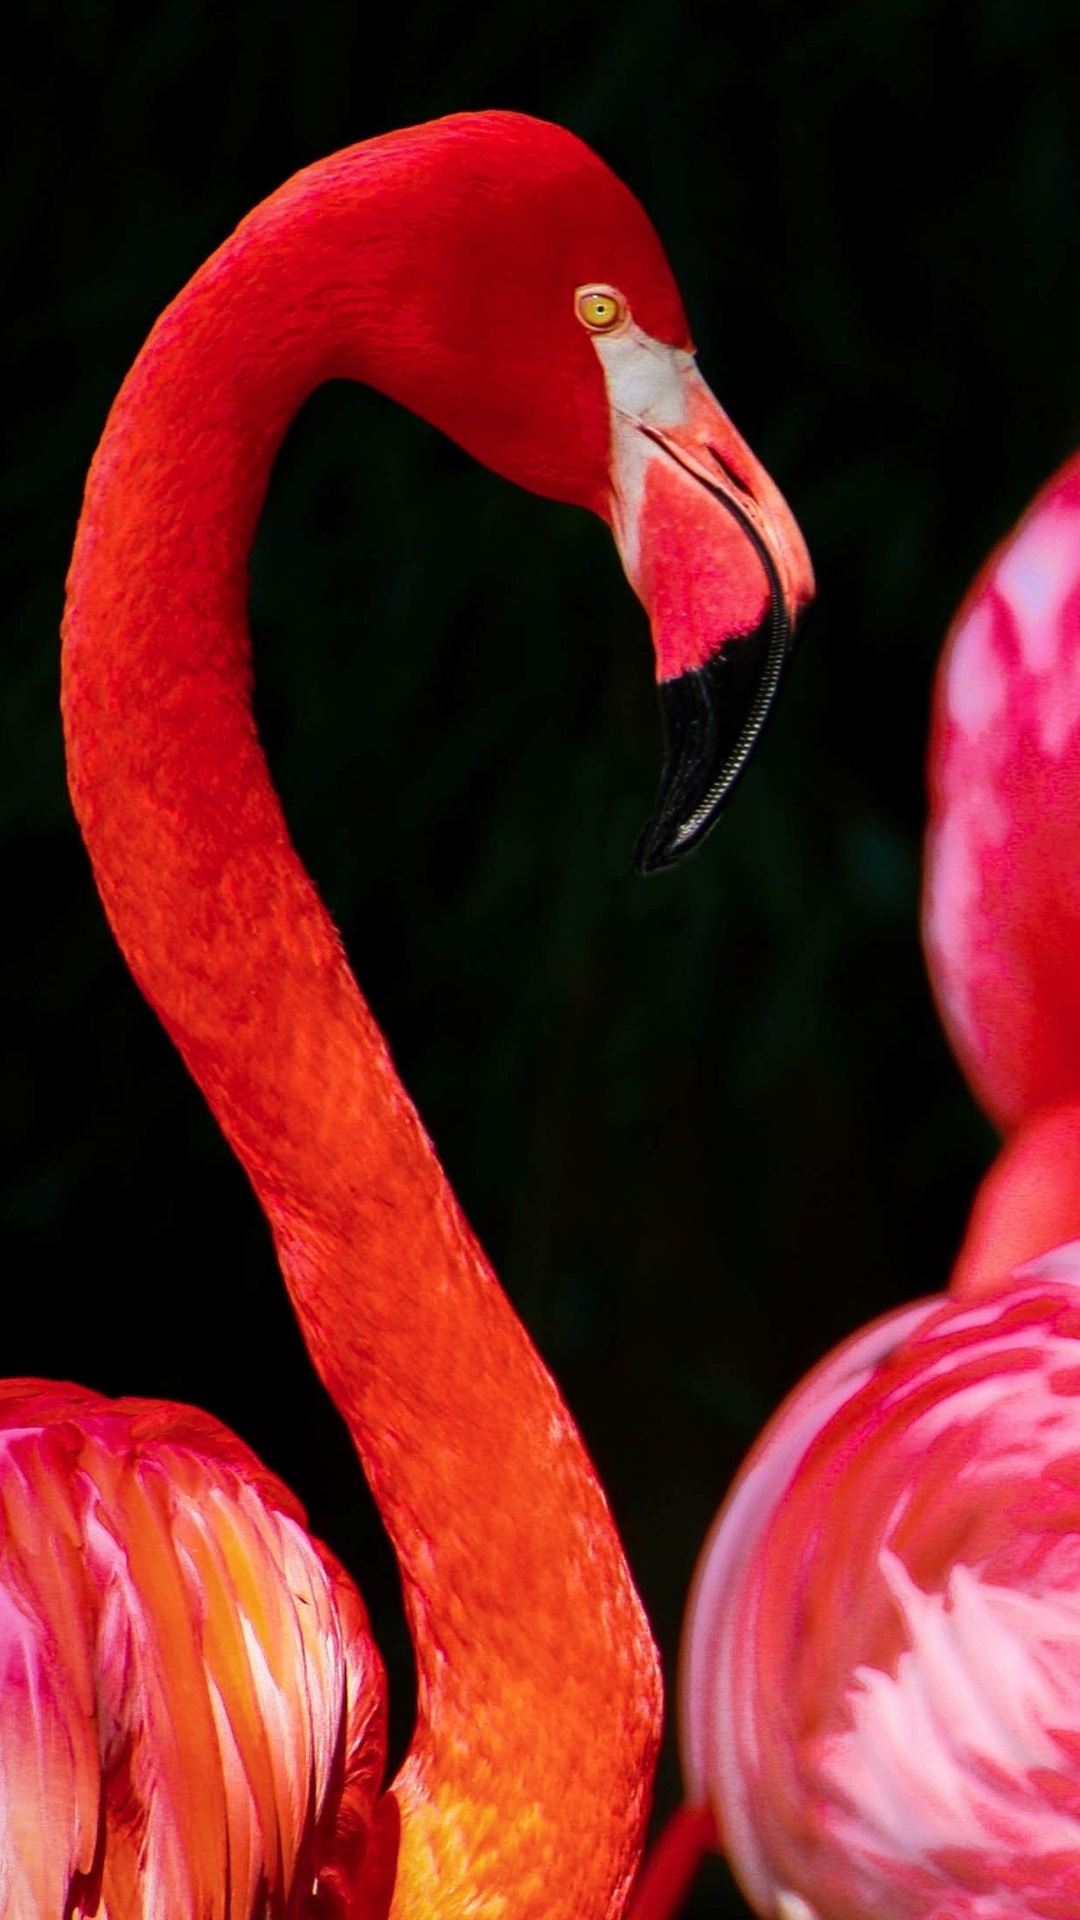 Red Feather Bird Flamingo Black Background 1080x1920